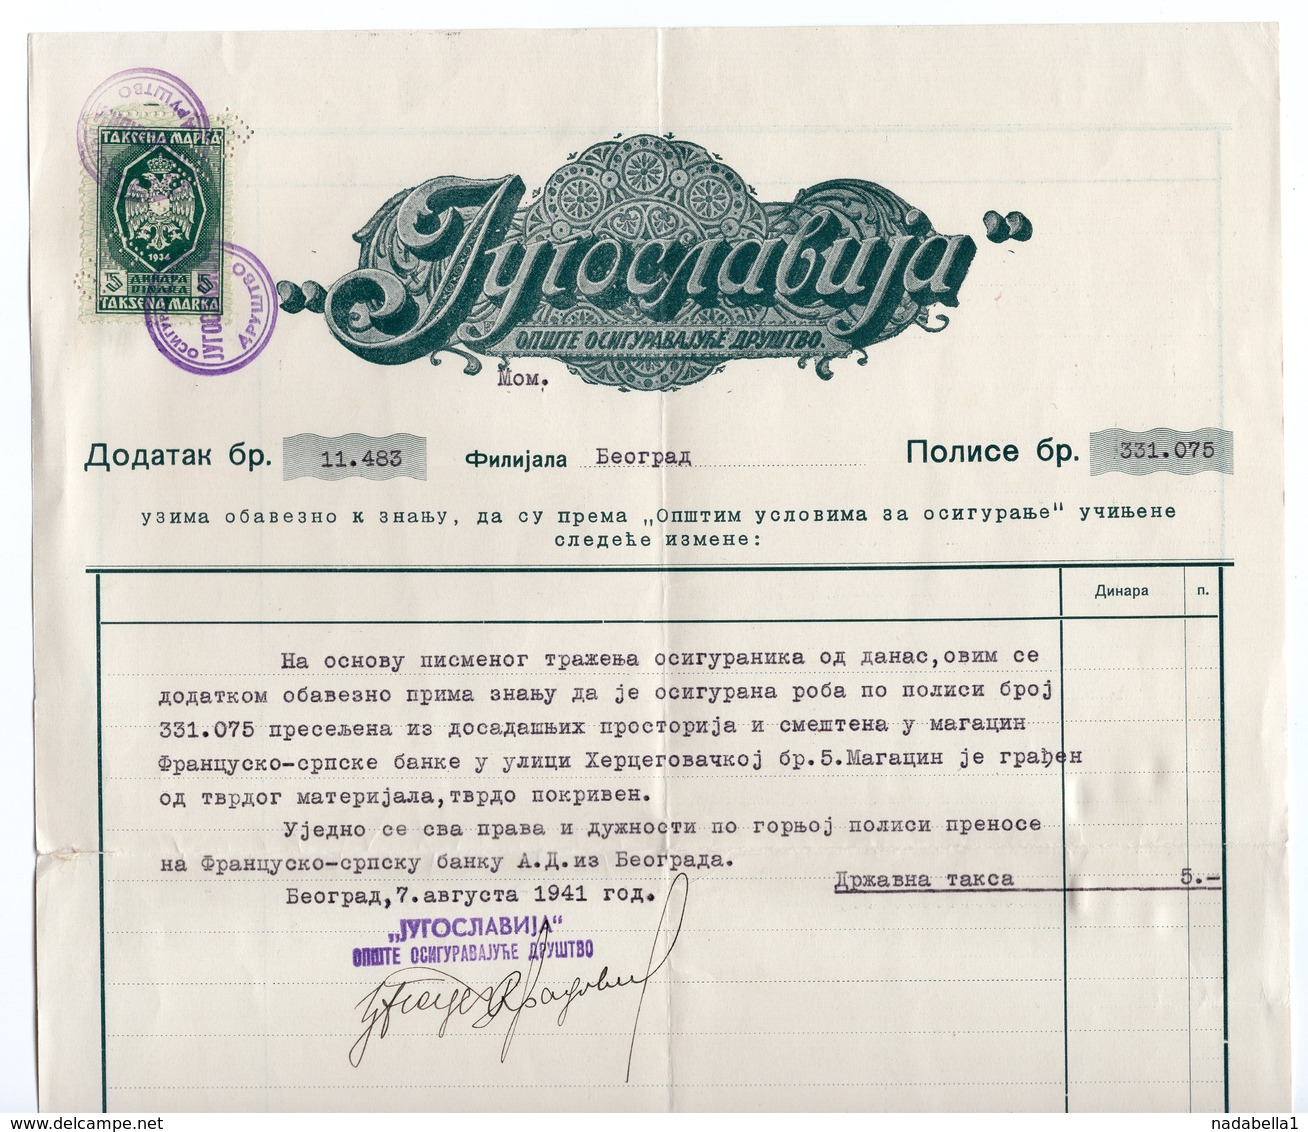 1941 YUGOSLAVIA, SERBIA, JUGOSLAVIA, INSURANCE POLICY, LETTERHEAD, FISKAL STAMP - Invoices & Commercial Documents